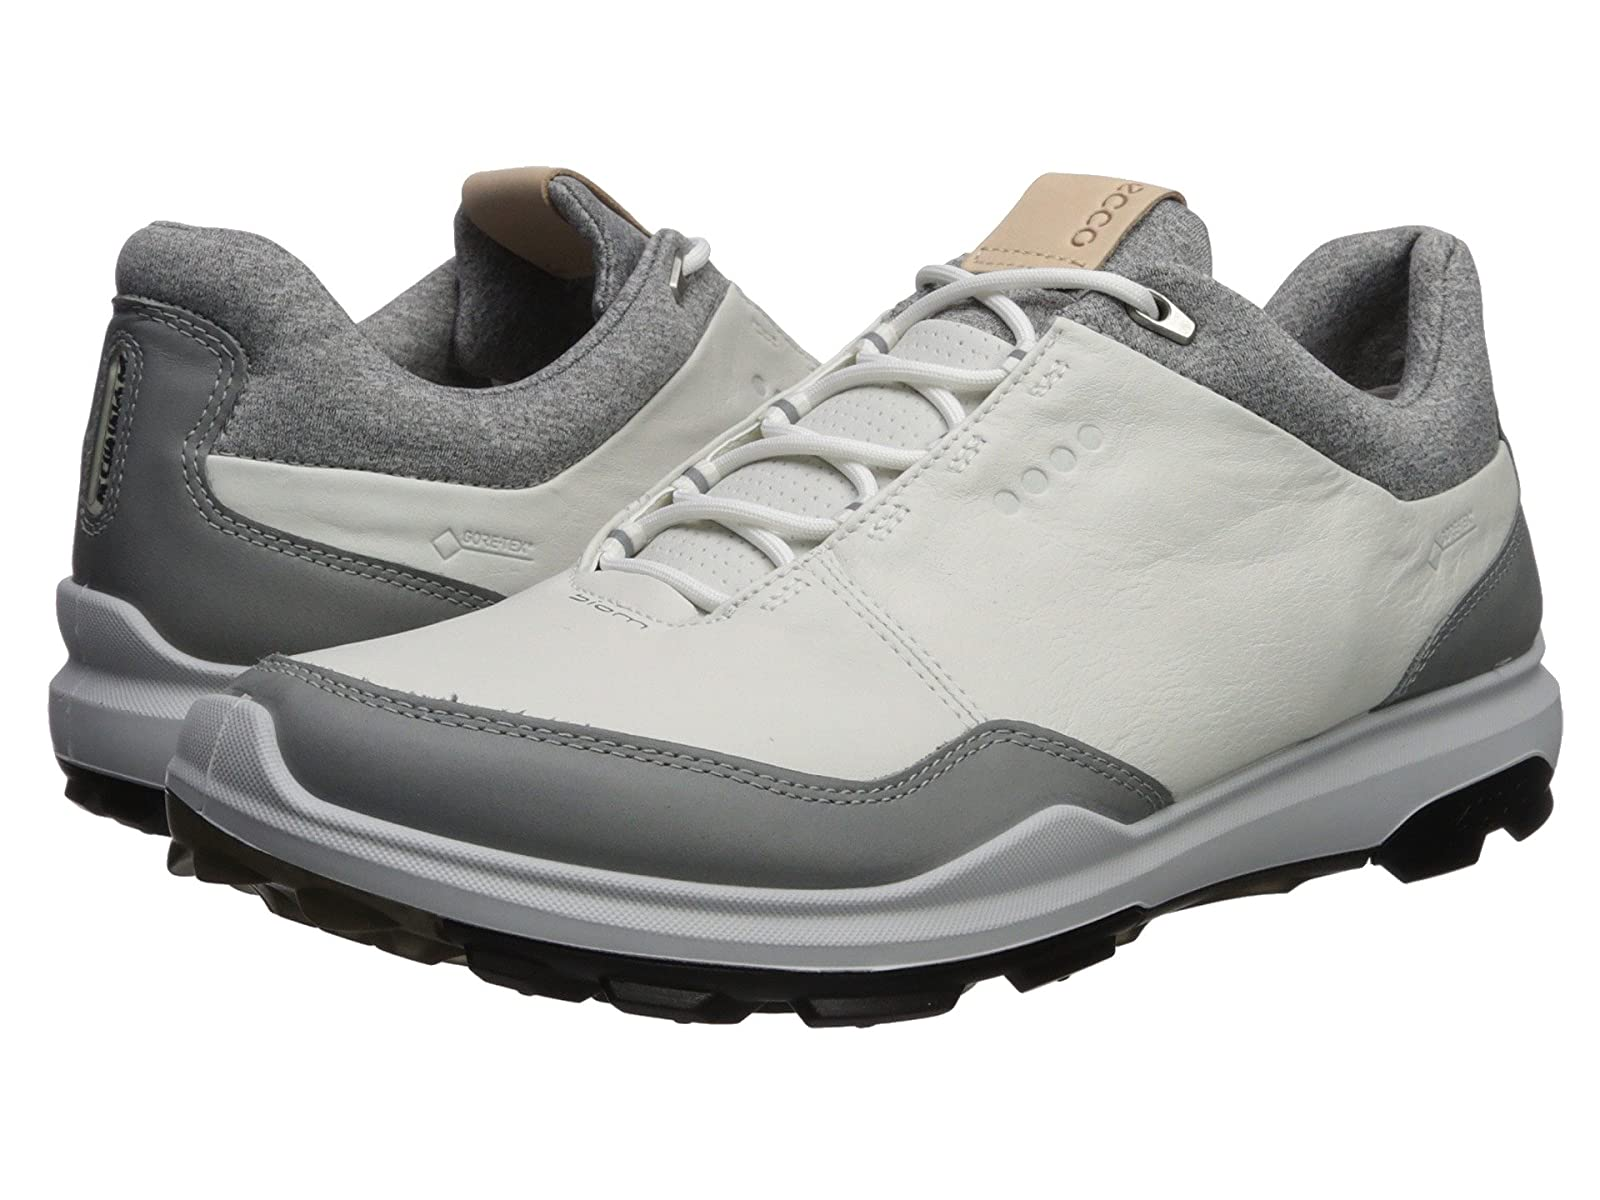 ECCO Golf Biom Hybrid 3 GTXAtmospheric grades have affordable shoes